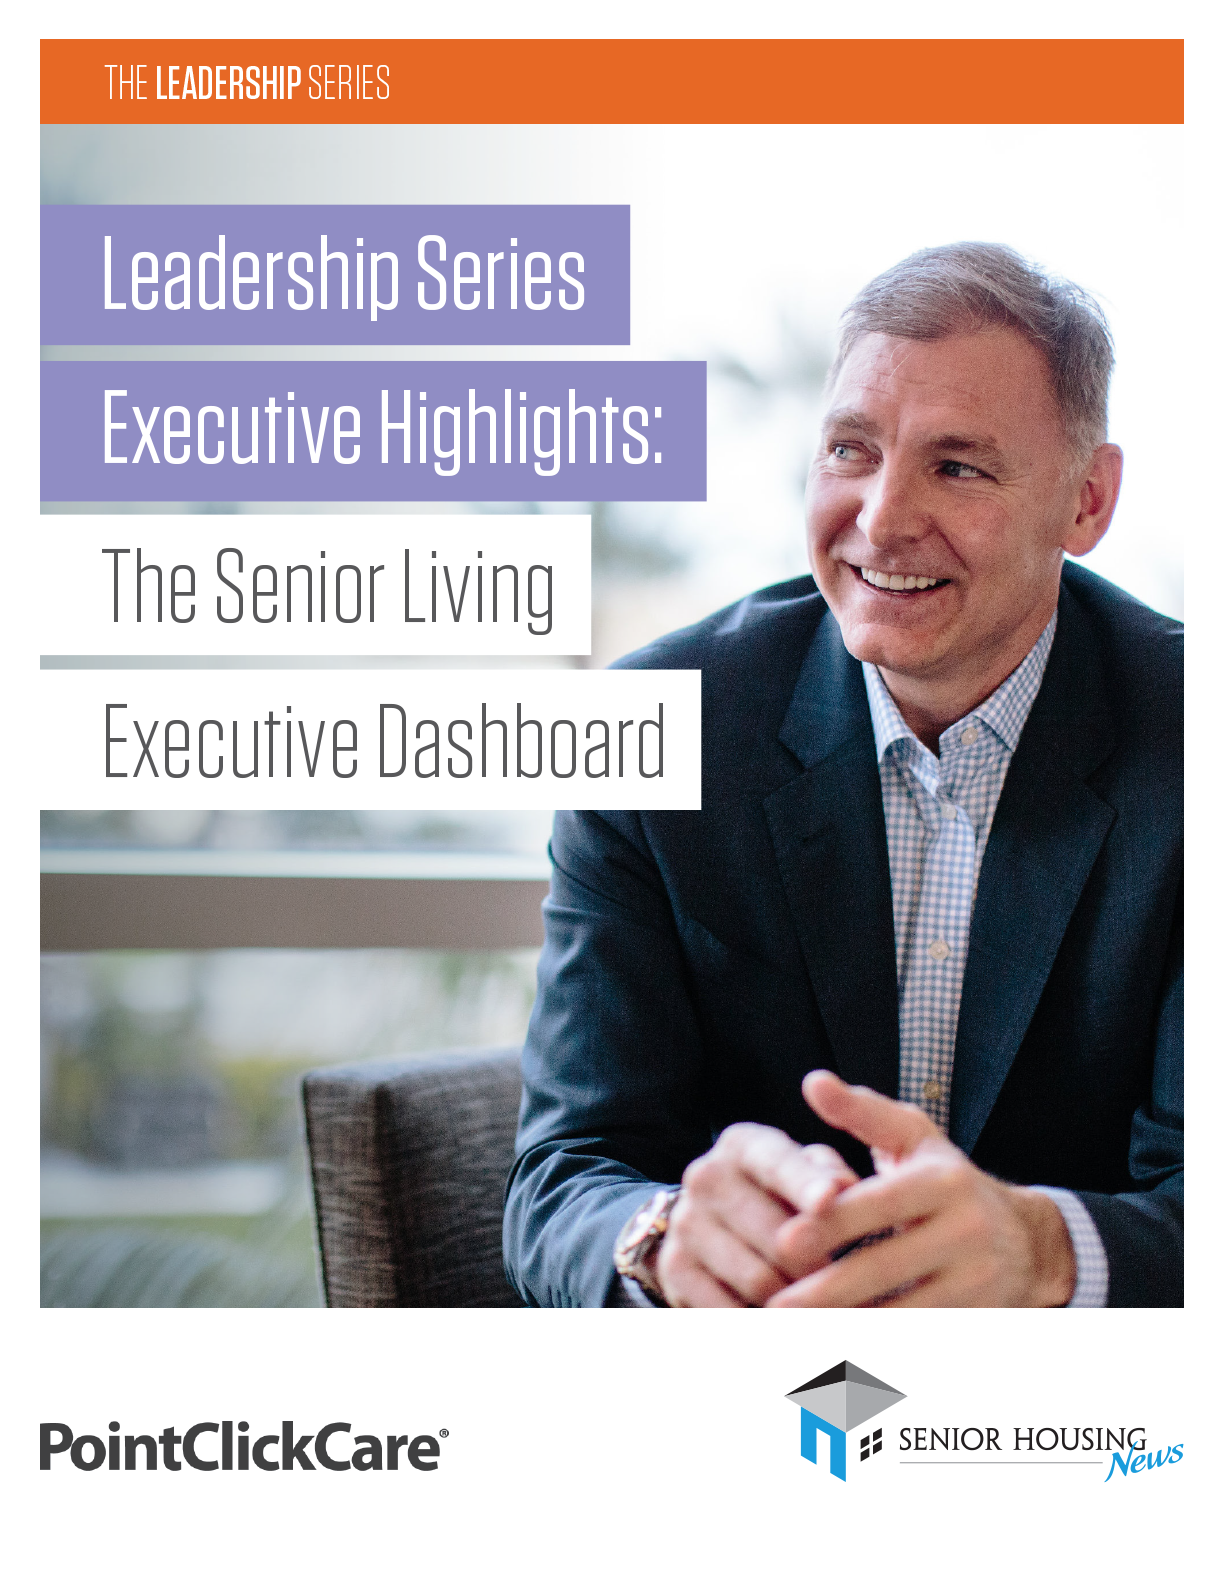 The Leadership Series Executive Highlights: The Senior Living Executive Dashboard